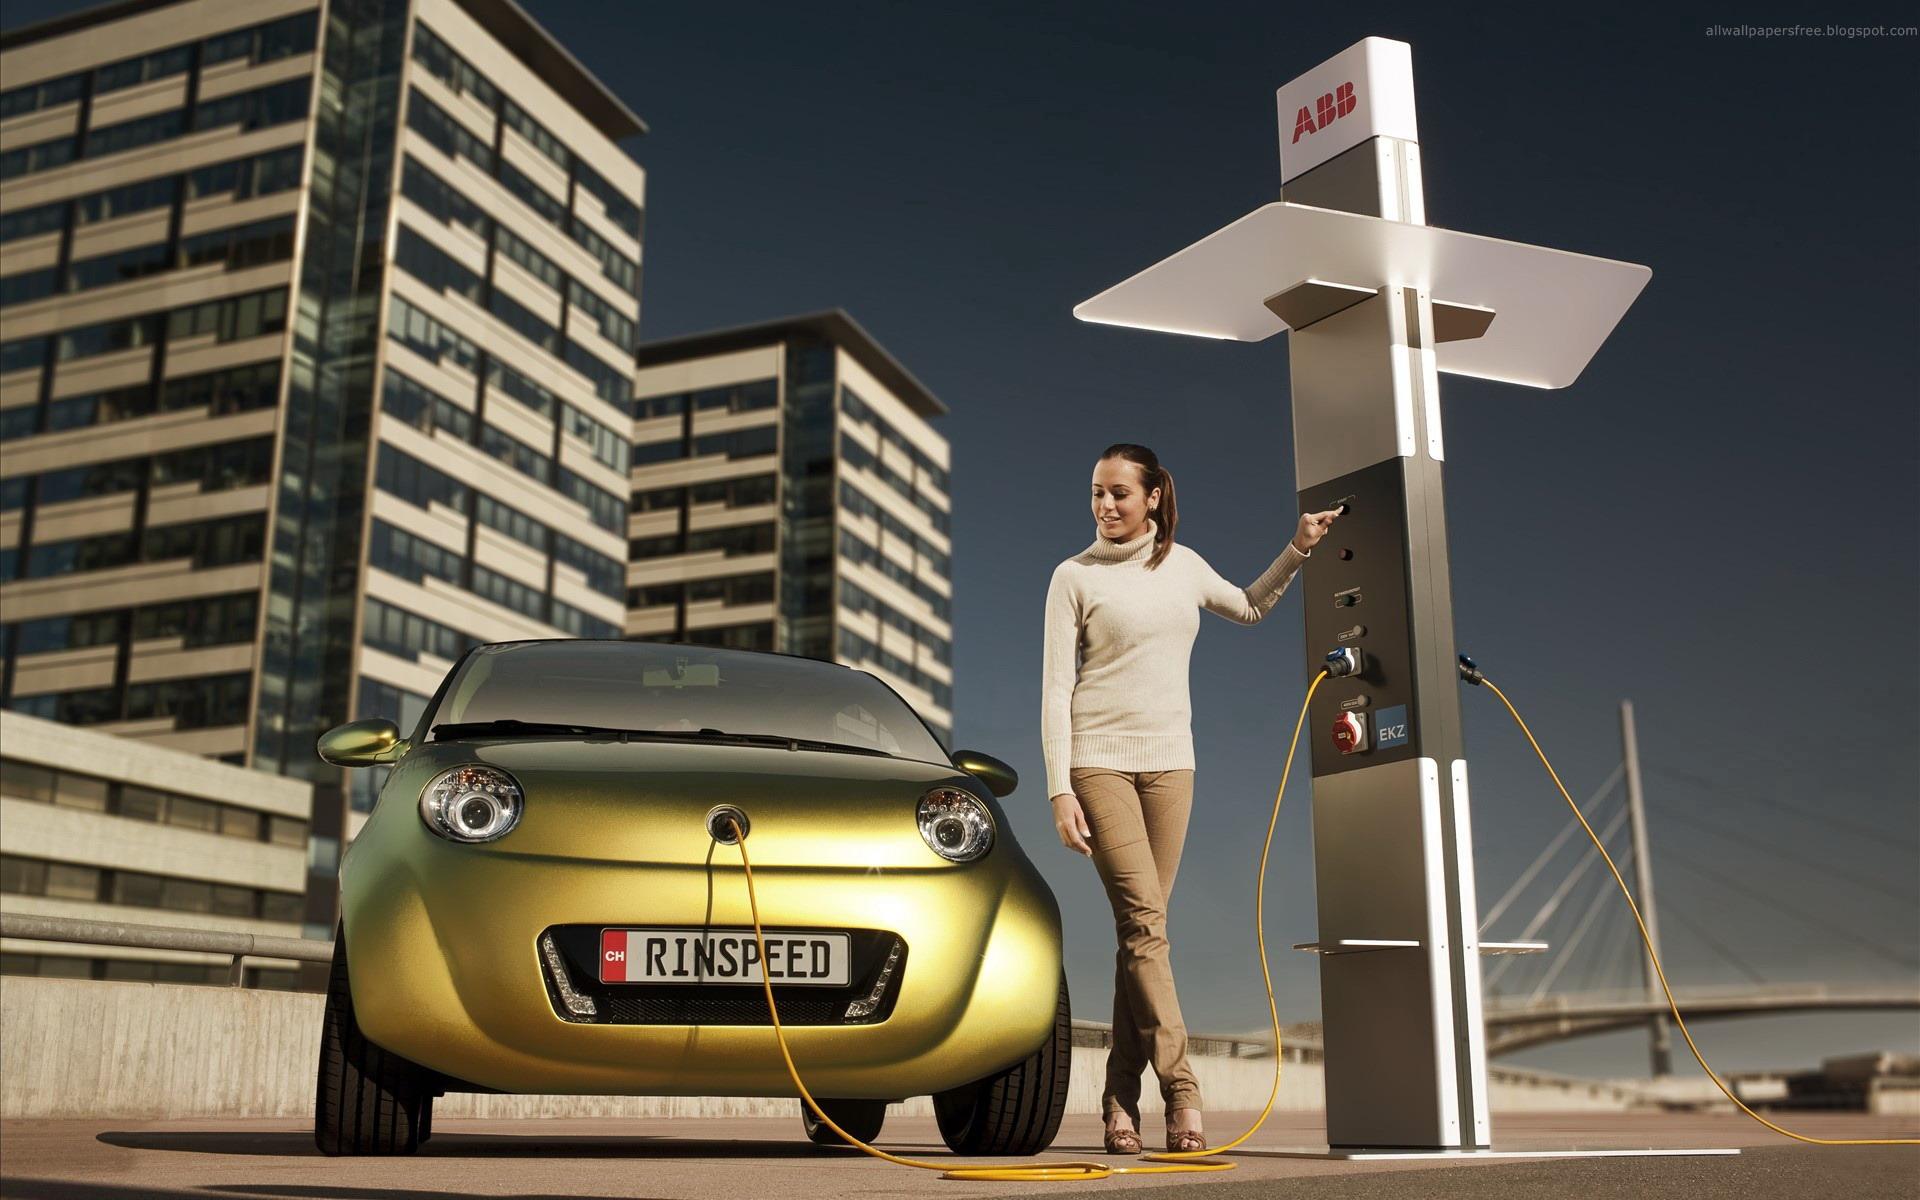 Car HD Wallpaper Background Image 1920x1200 ID244491 1920x1200